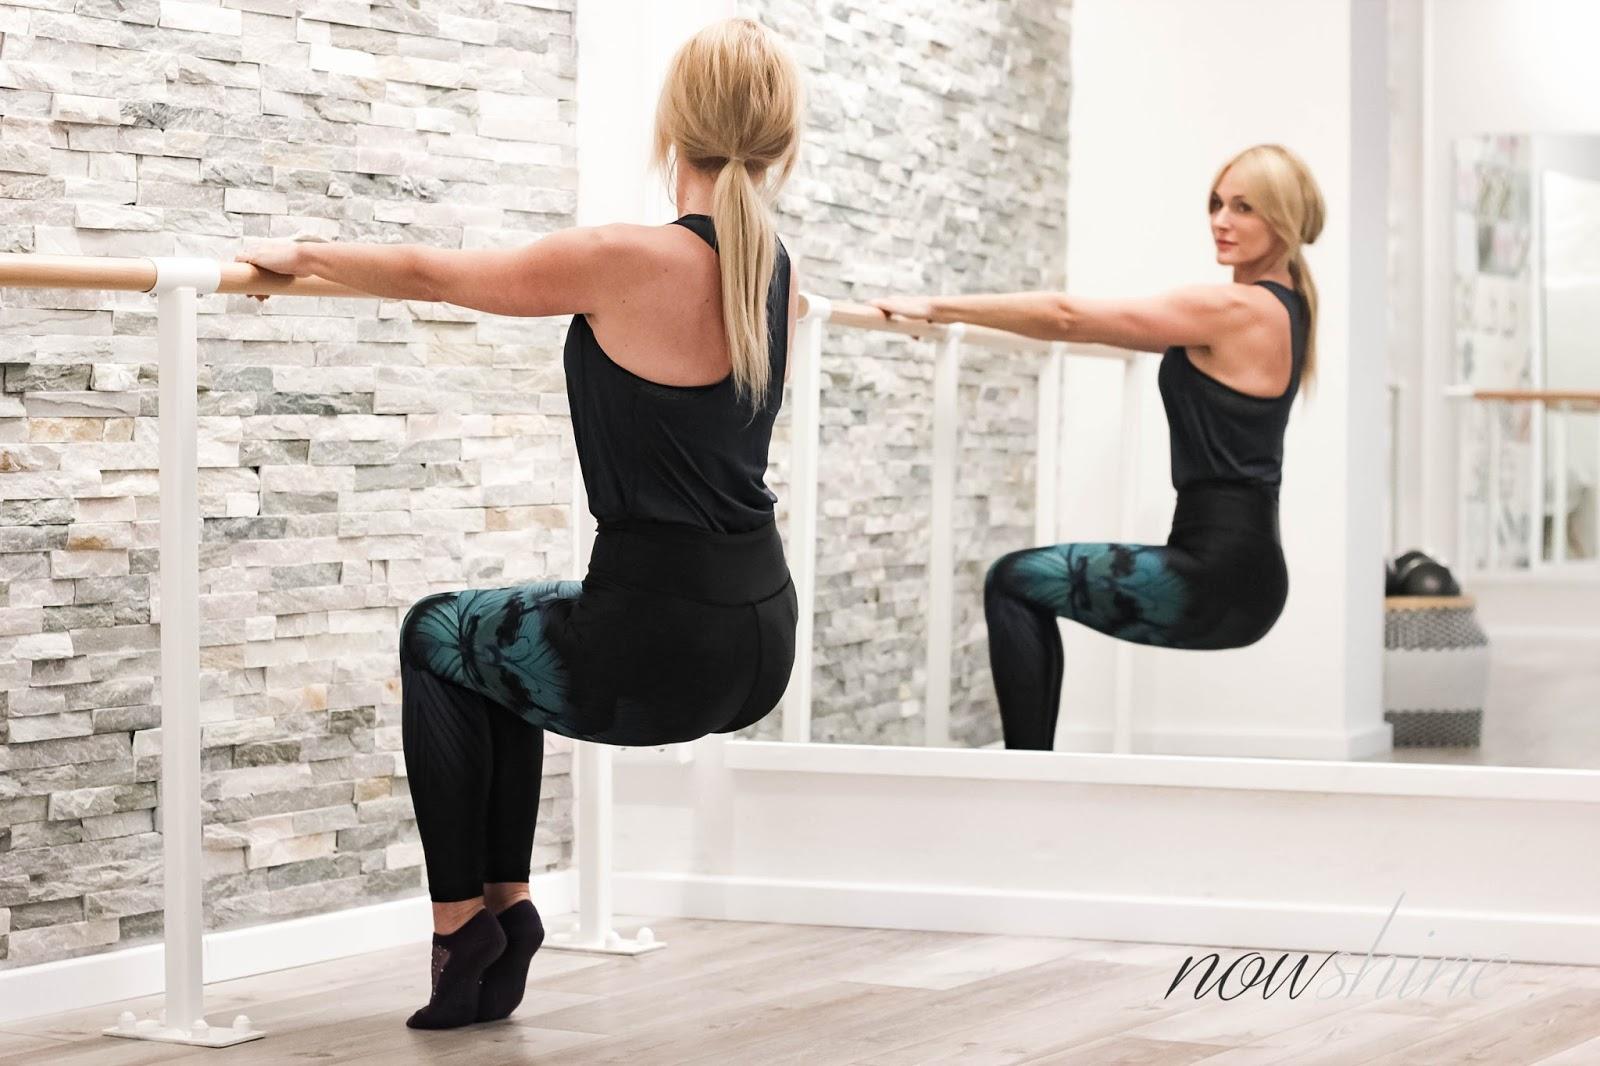 Ballett Barre Workout bei Youpila Düsseldorf - Fitnessblog über 40